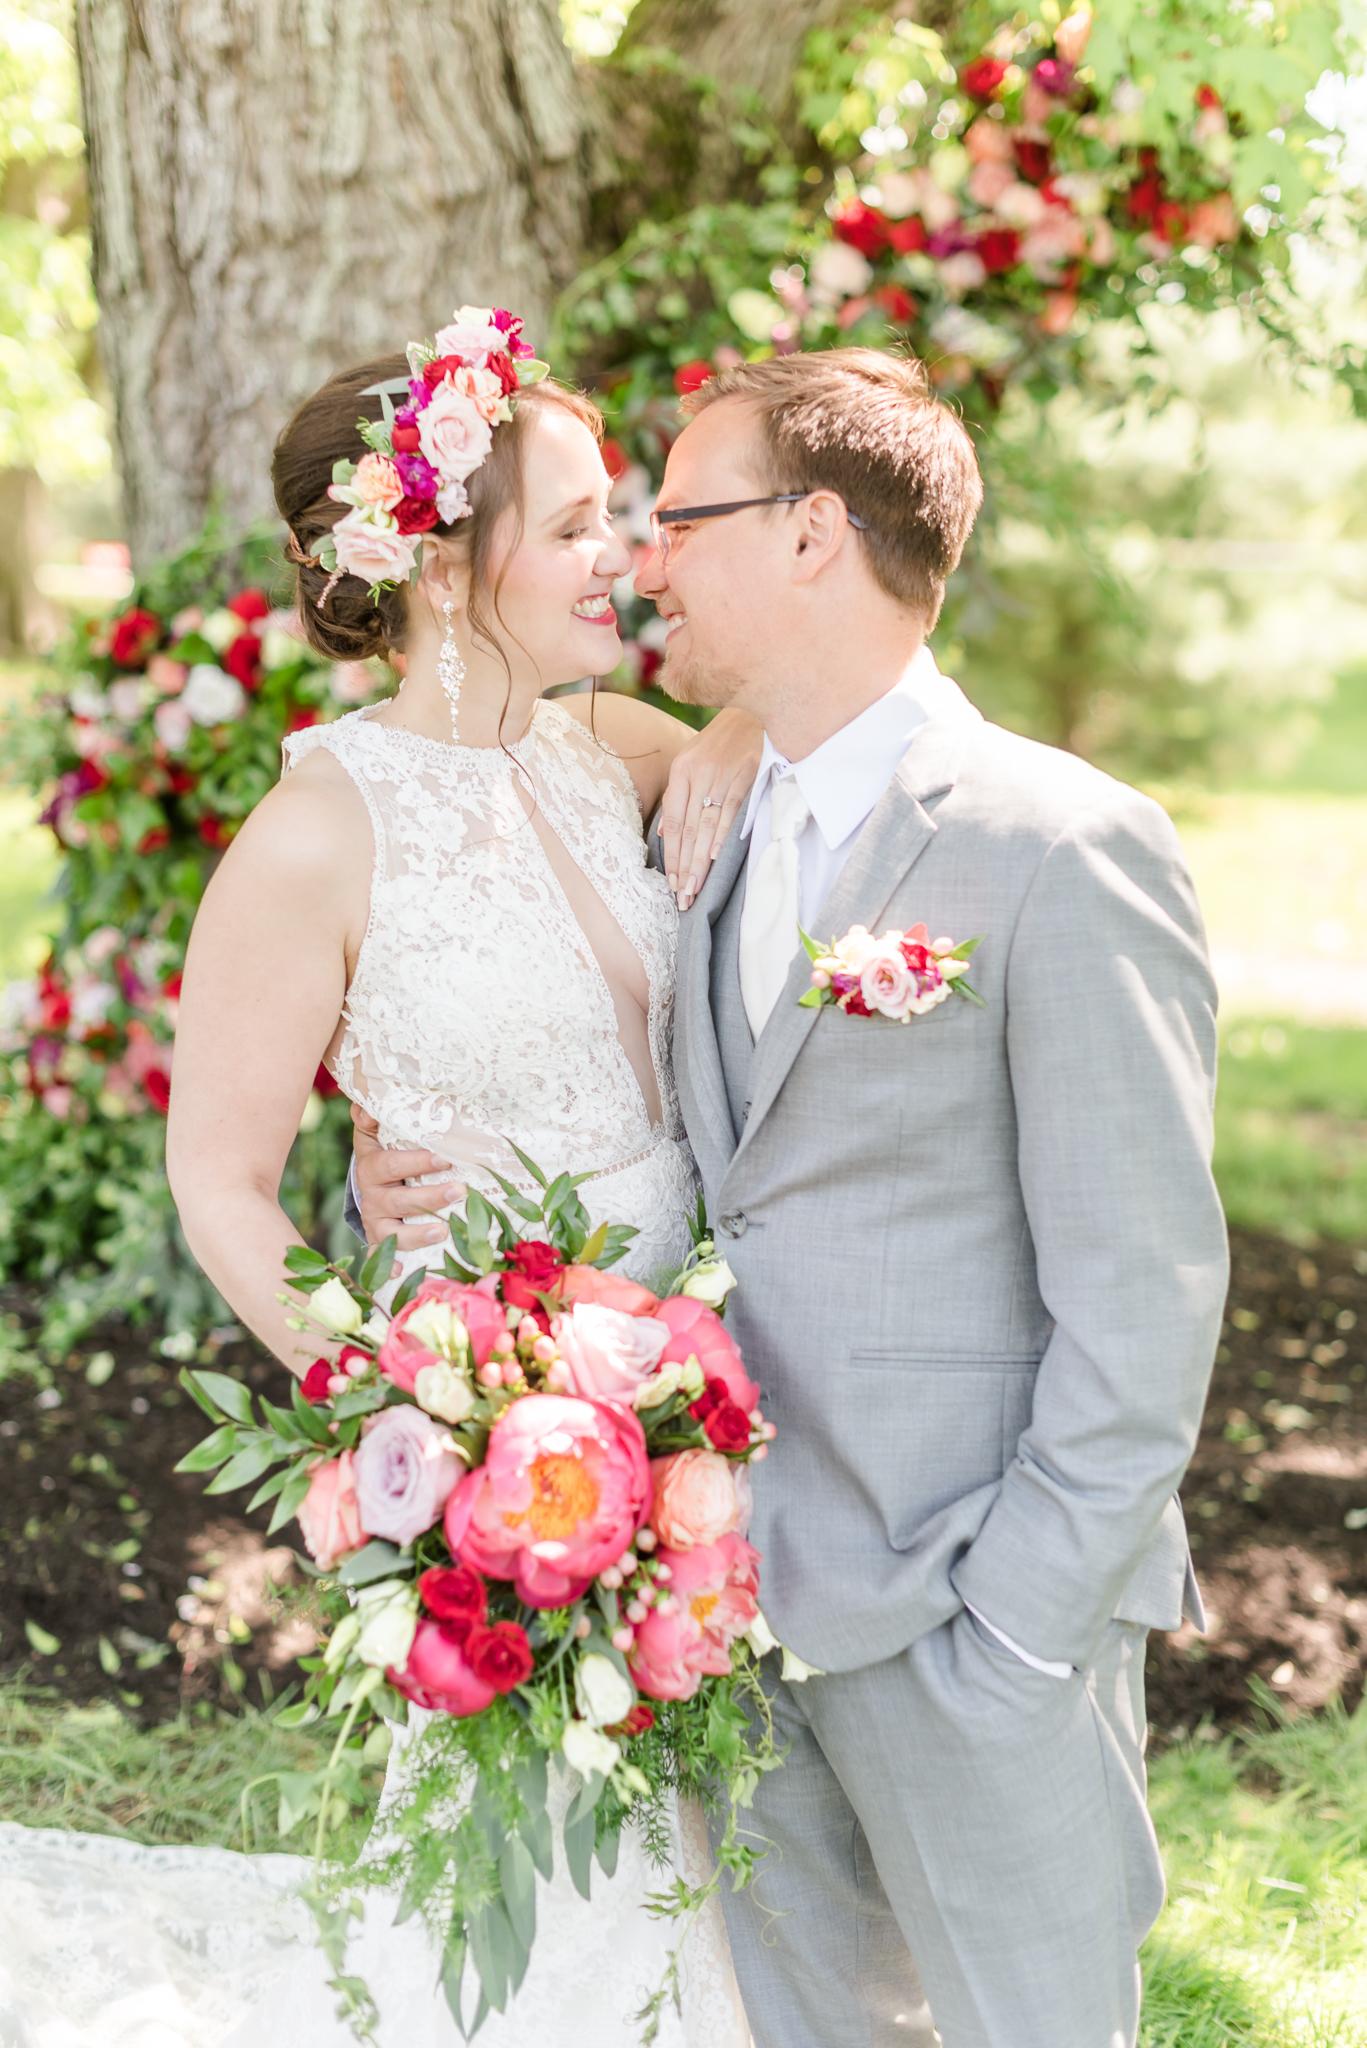 Mustard Seed Gardens Wedding Indianapolis Noblesvile Fishers Wedding Photographer-39.jpg